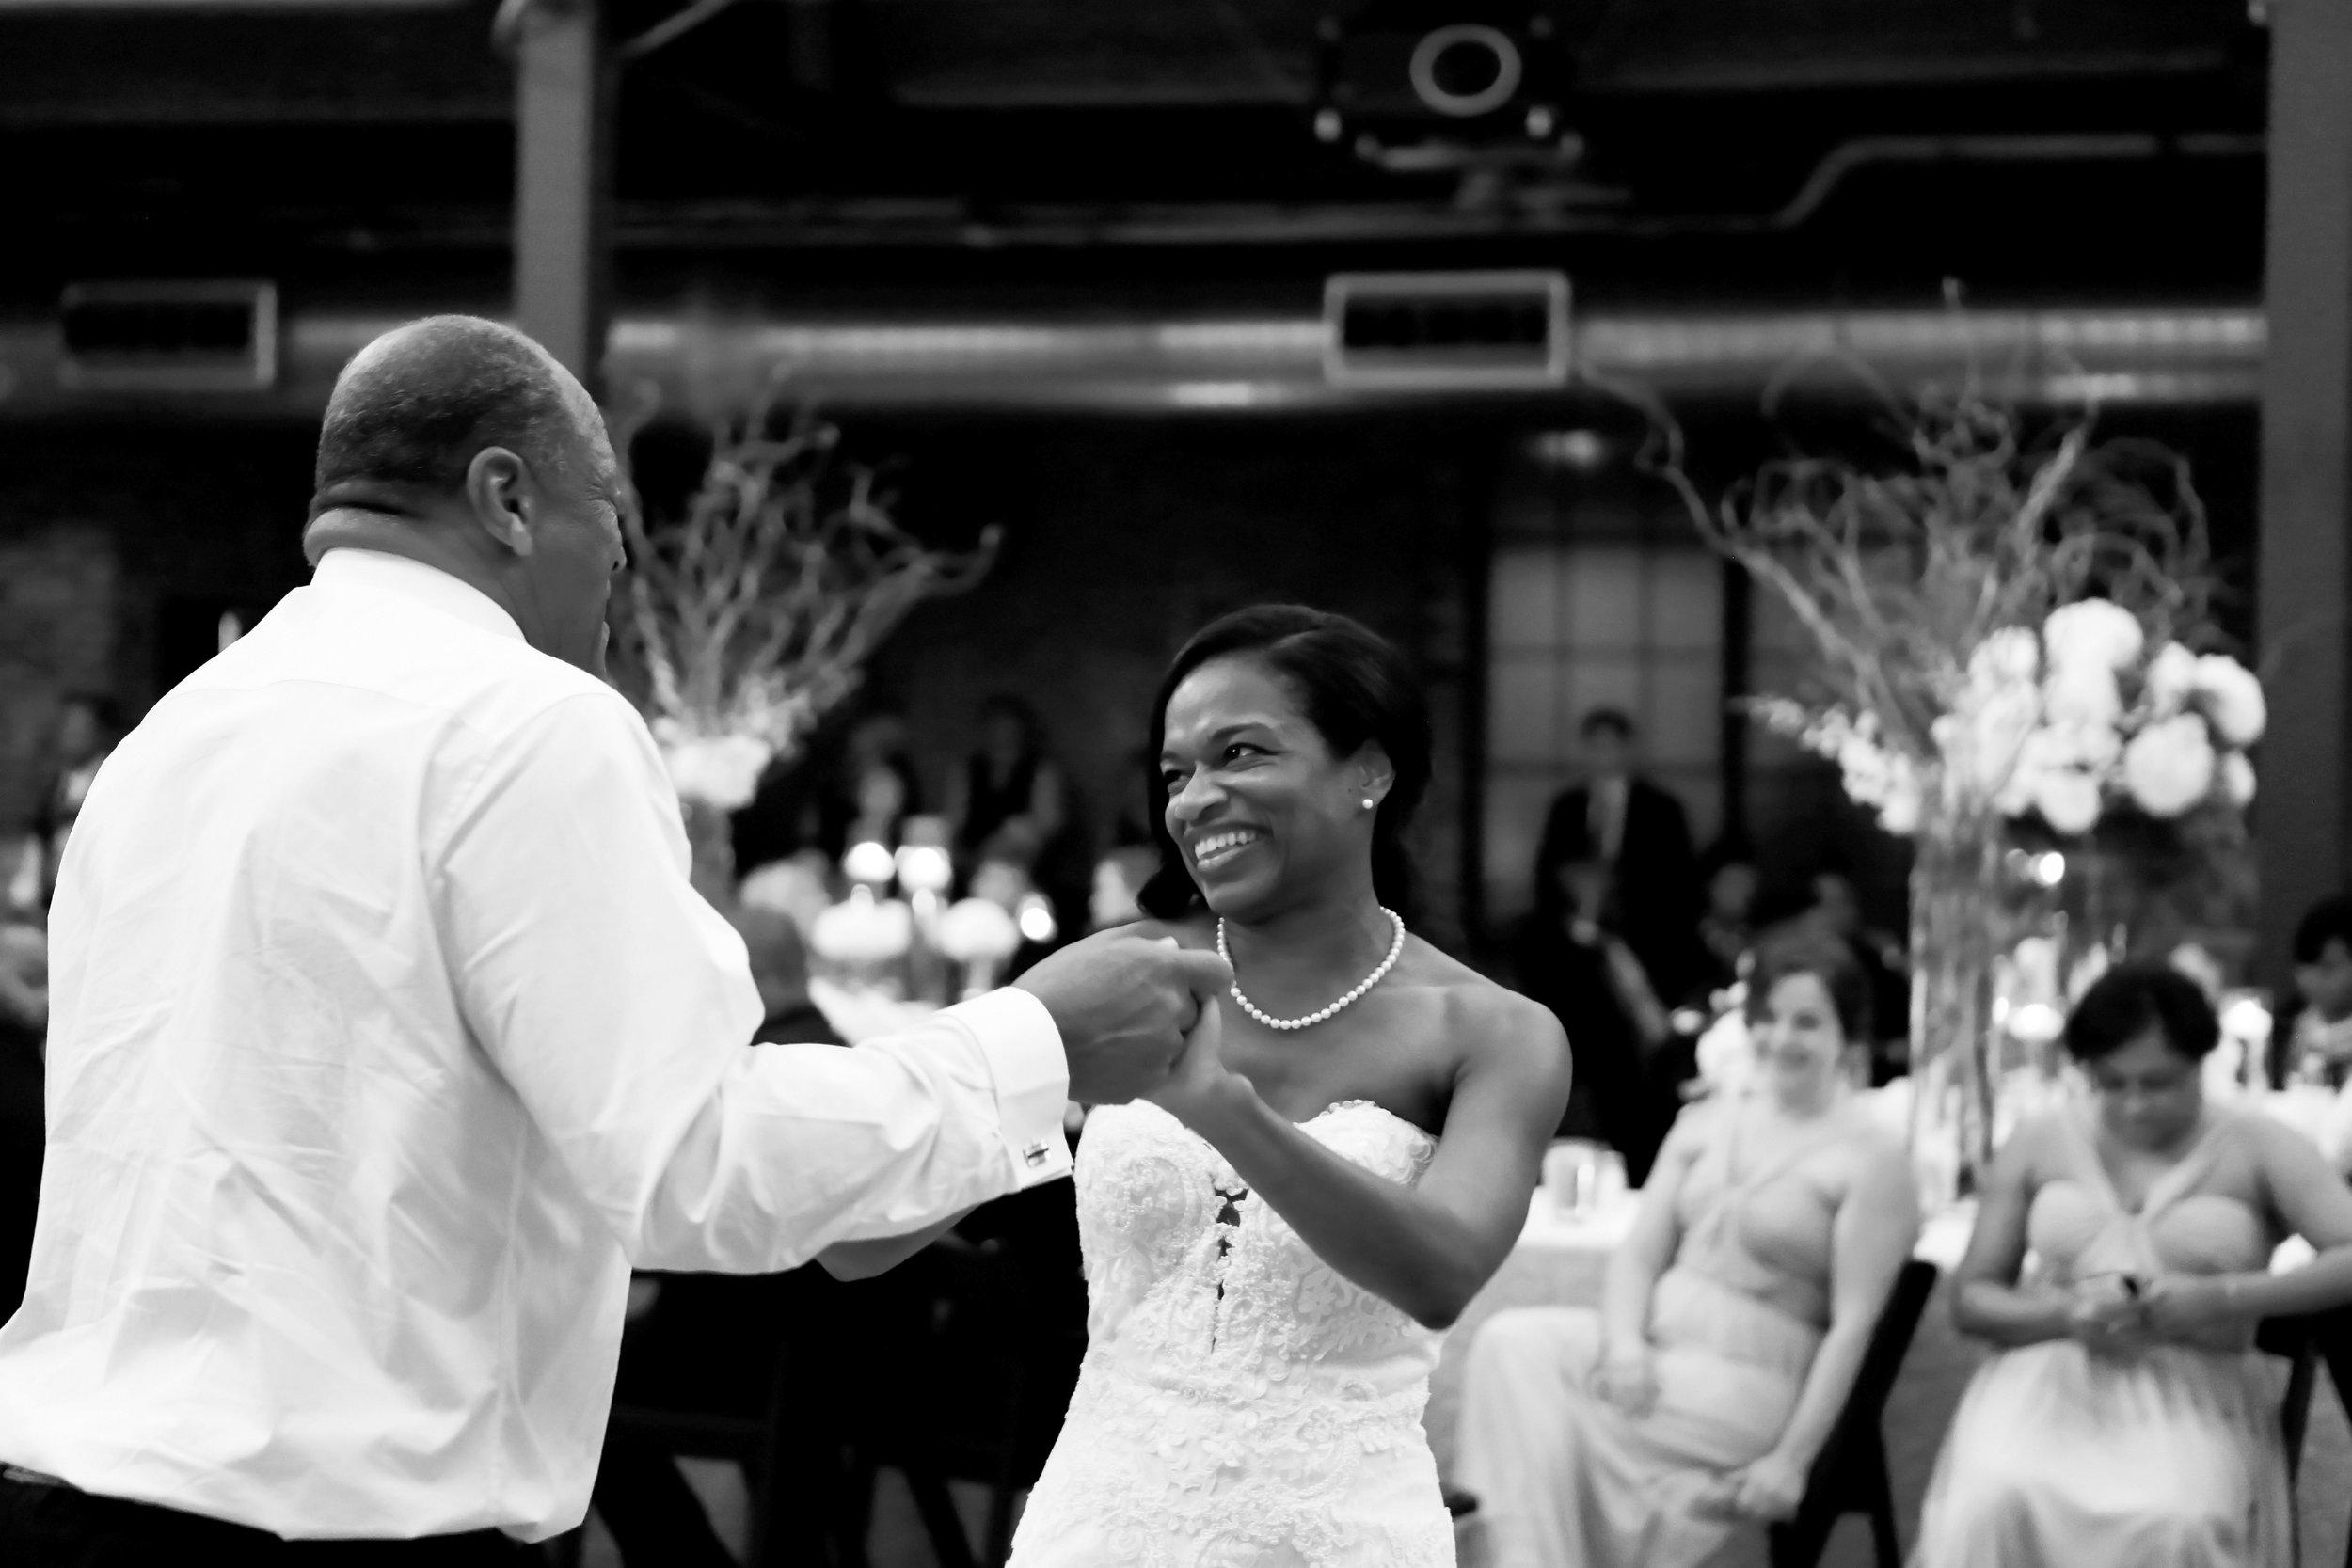 fatherdaughterdance.jpg